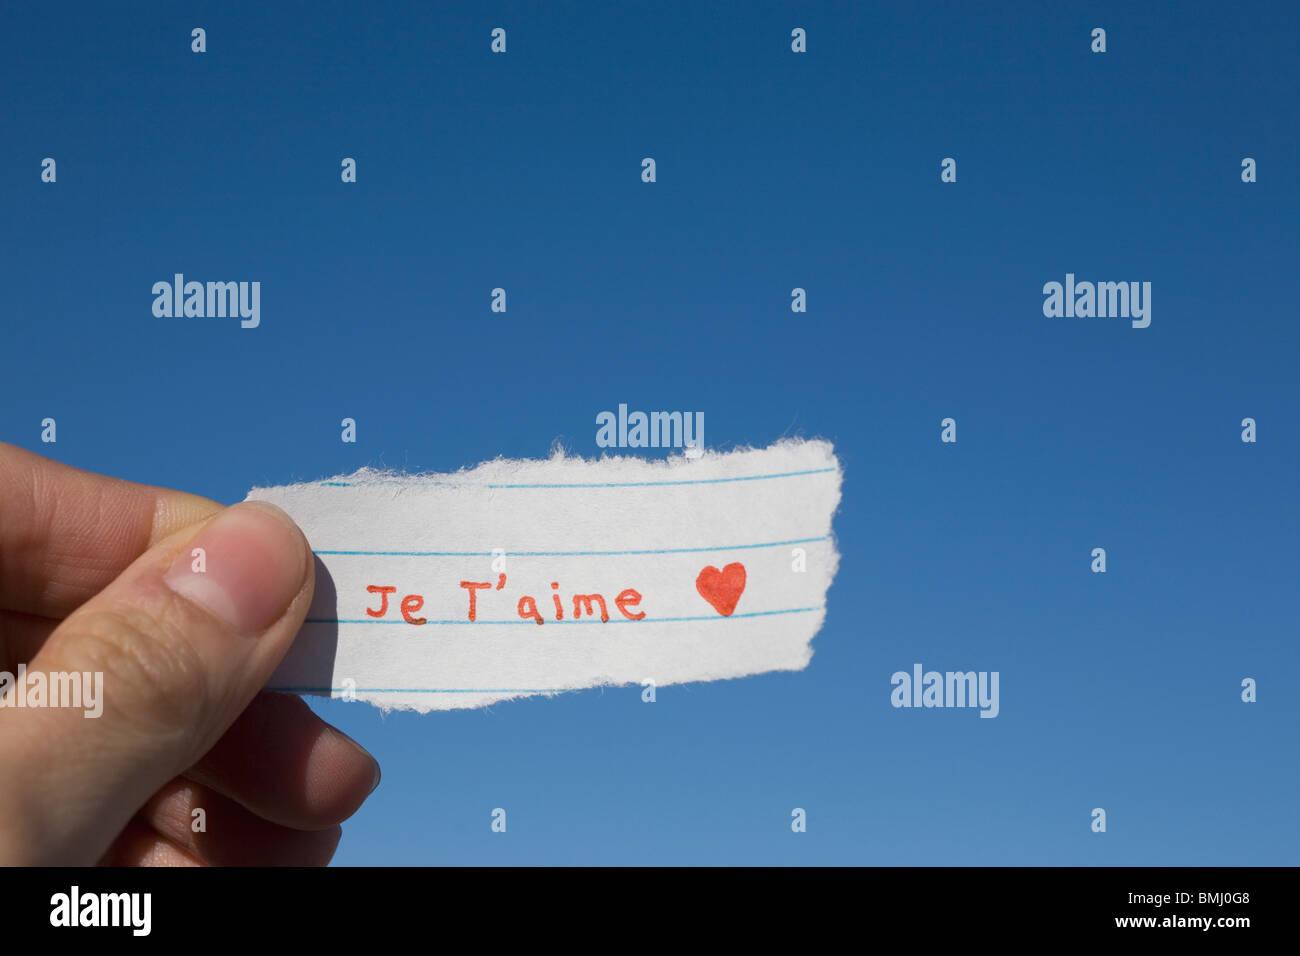 Amor Escrito En Arena: I Love You Imágenes De Stock & I Love You Fotos De Stock